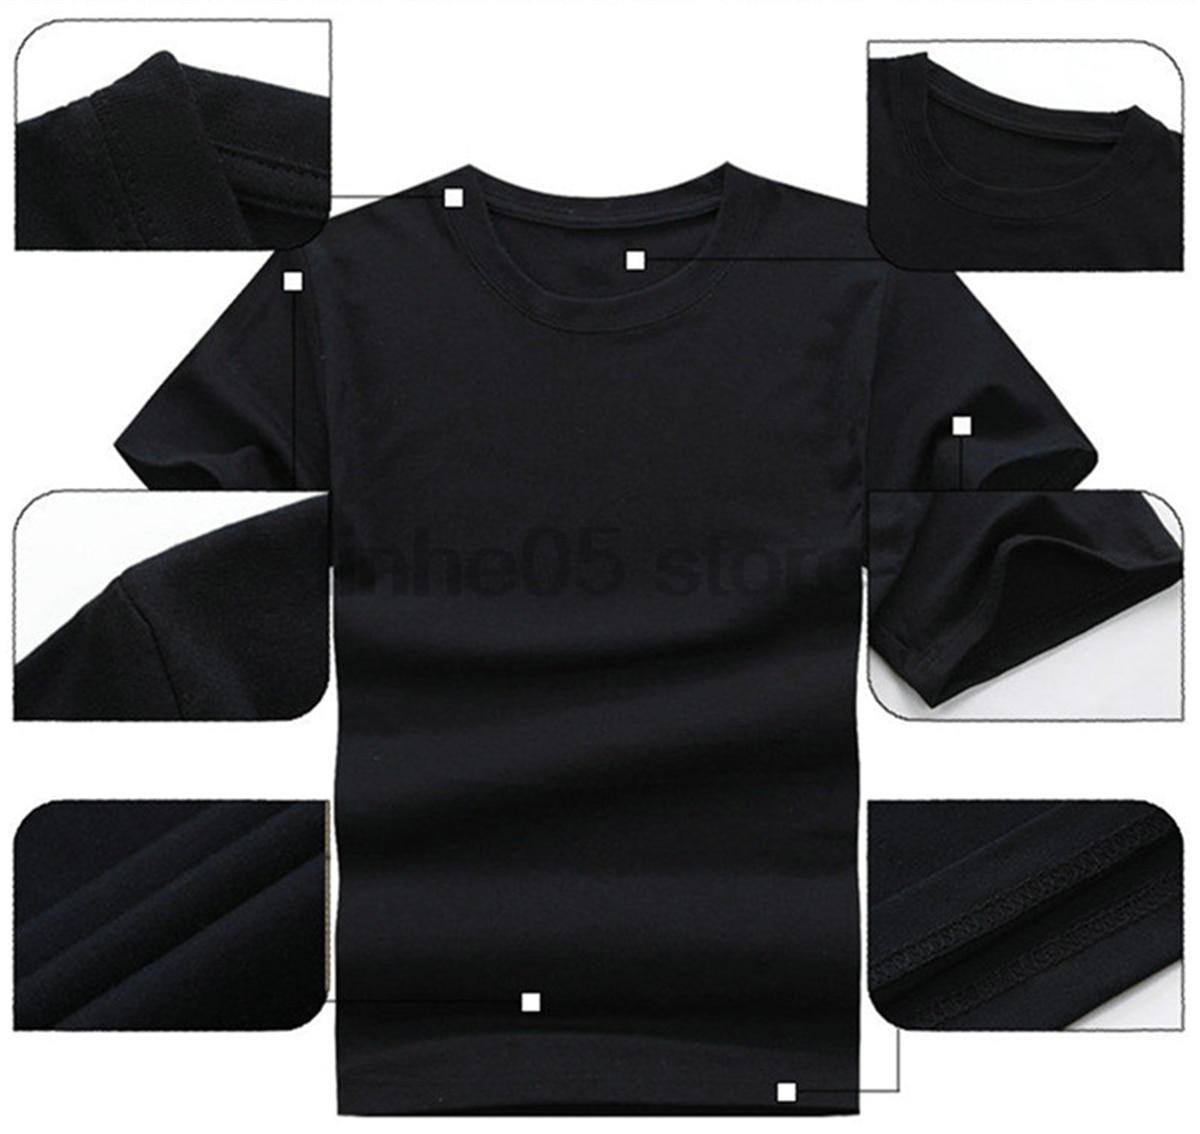 GILDAN Siberian Husky Shirt - Husky Breed Dog Owner Tee Hot Womens T-shirt